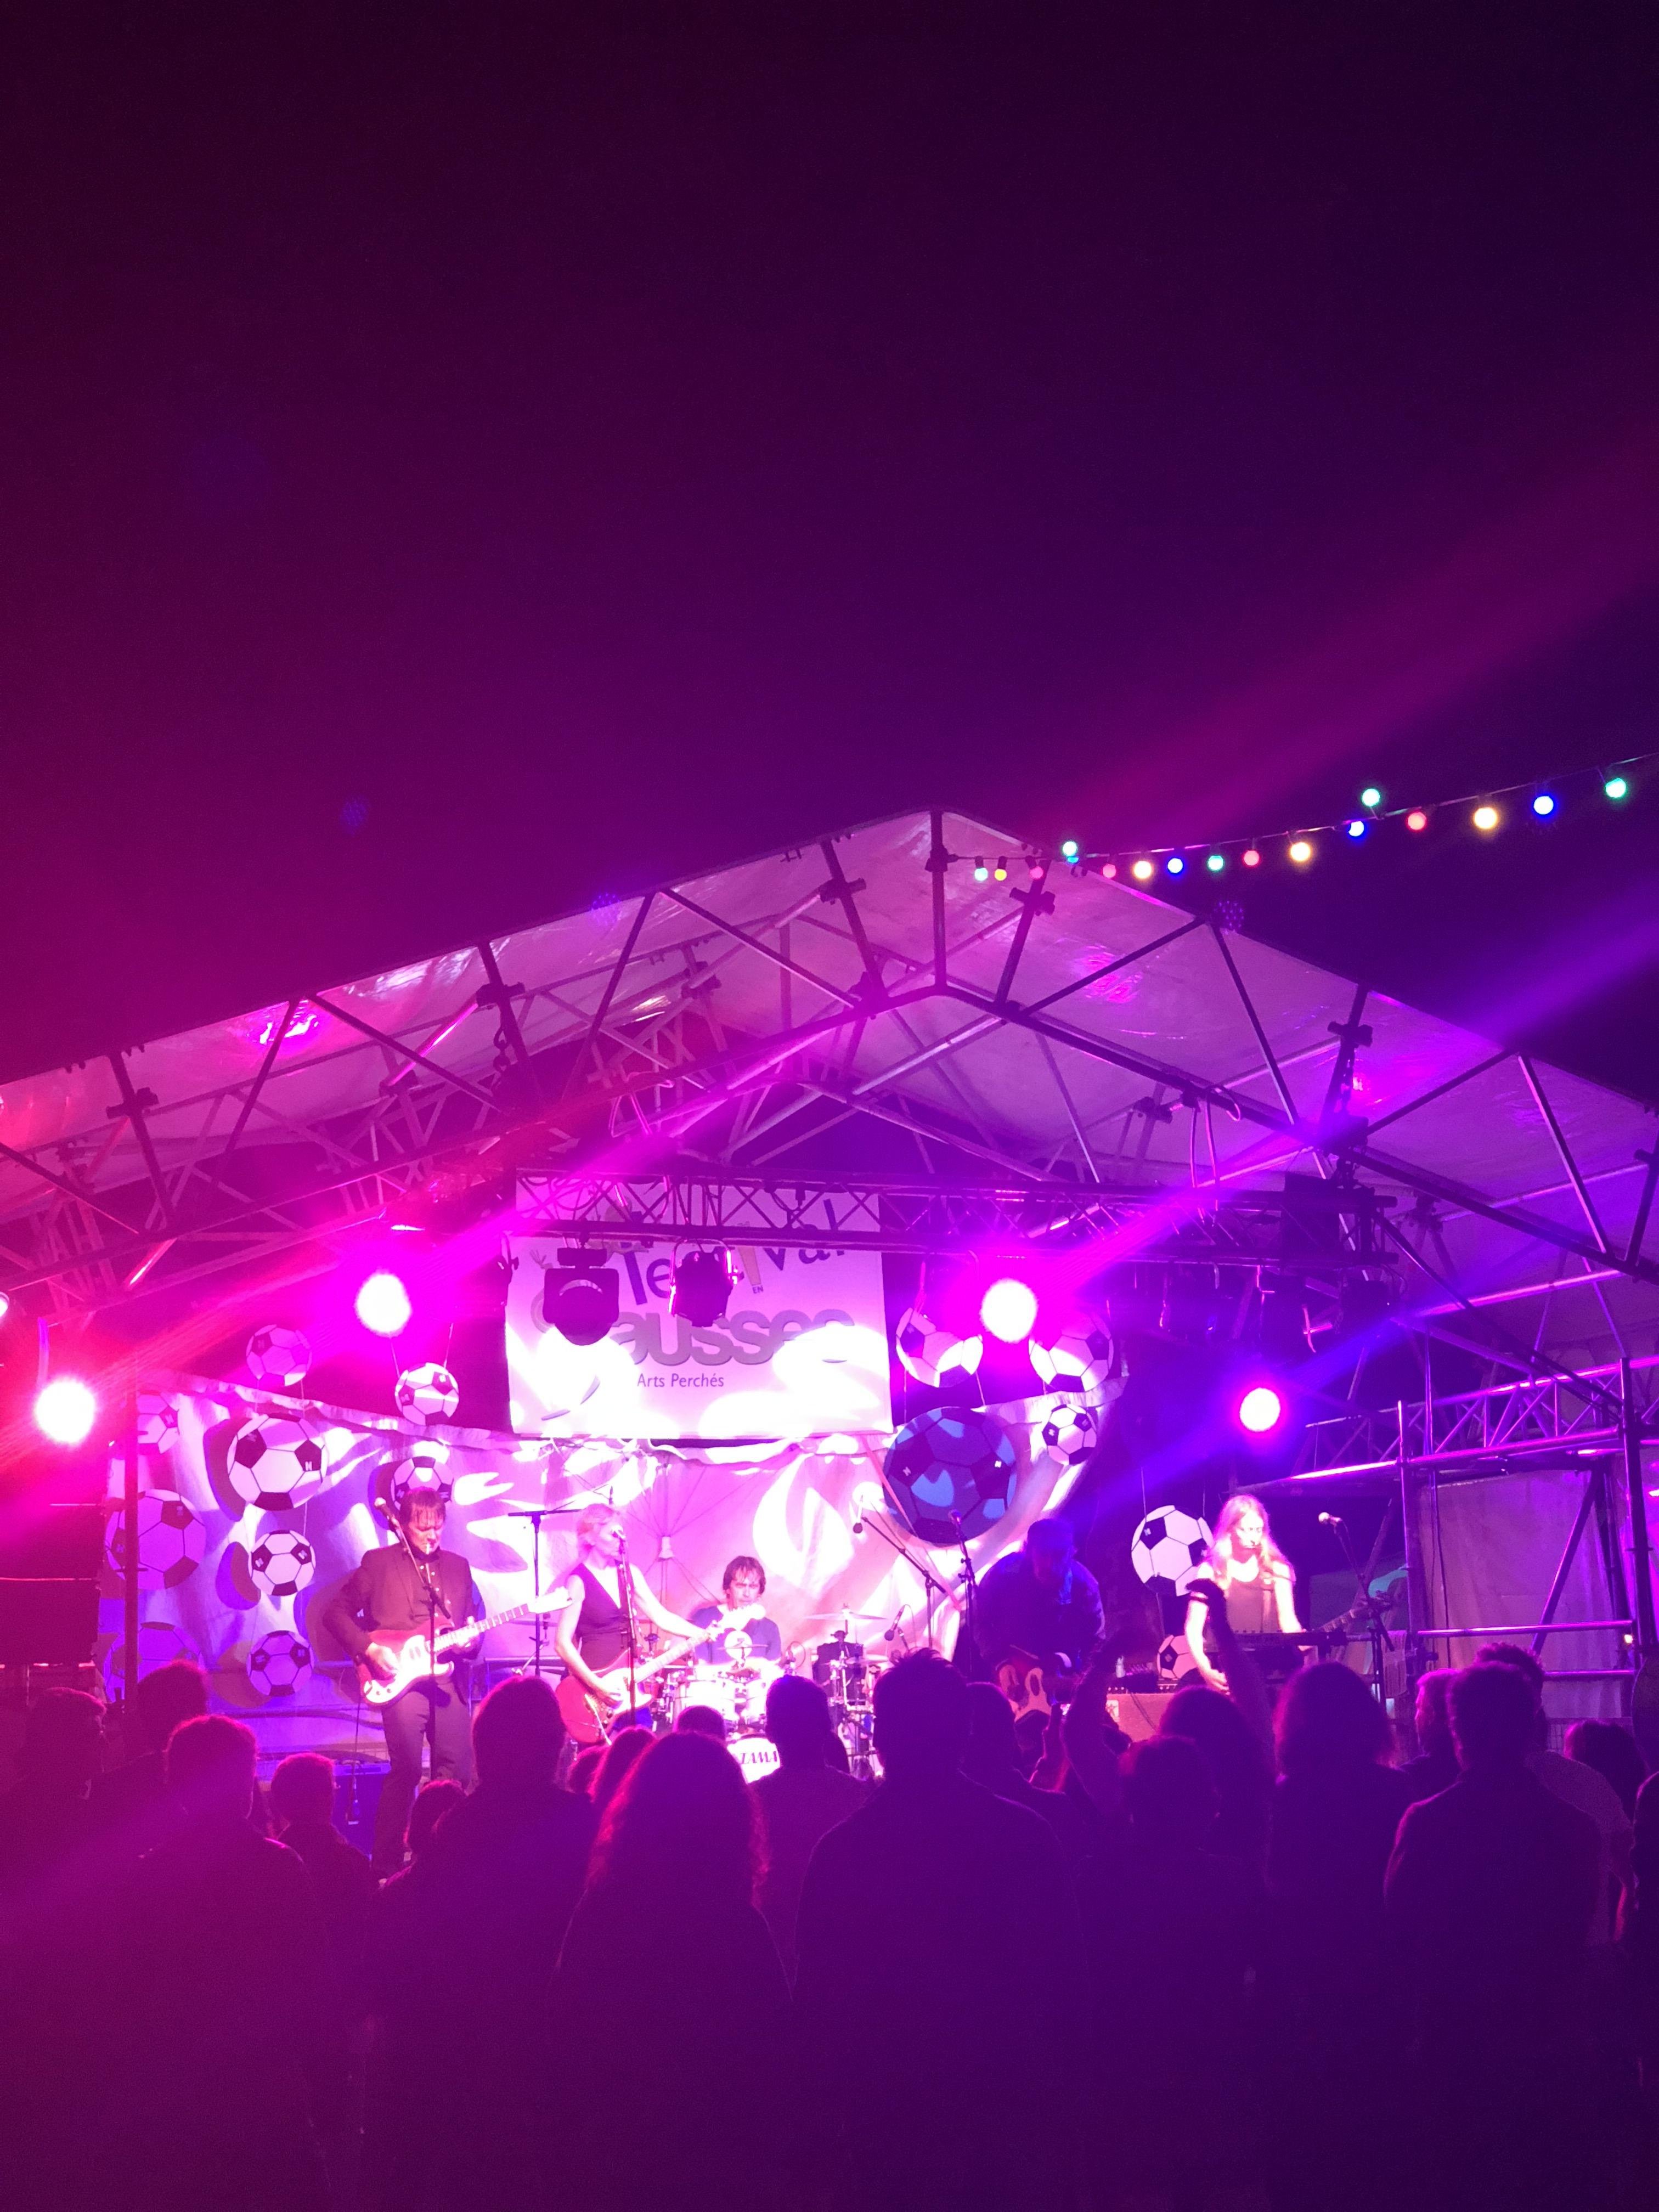 aucop-festival-festival en sausses-sonorisation-eclairage-cali-kolinka-dahan-scene-audiovisuel-evenementiel-alpes de haute provence-carros-nice